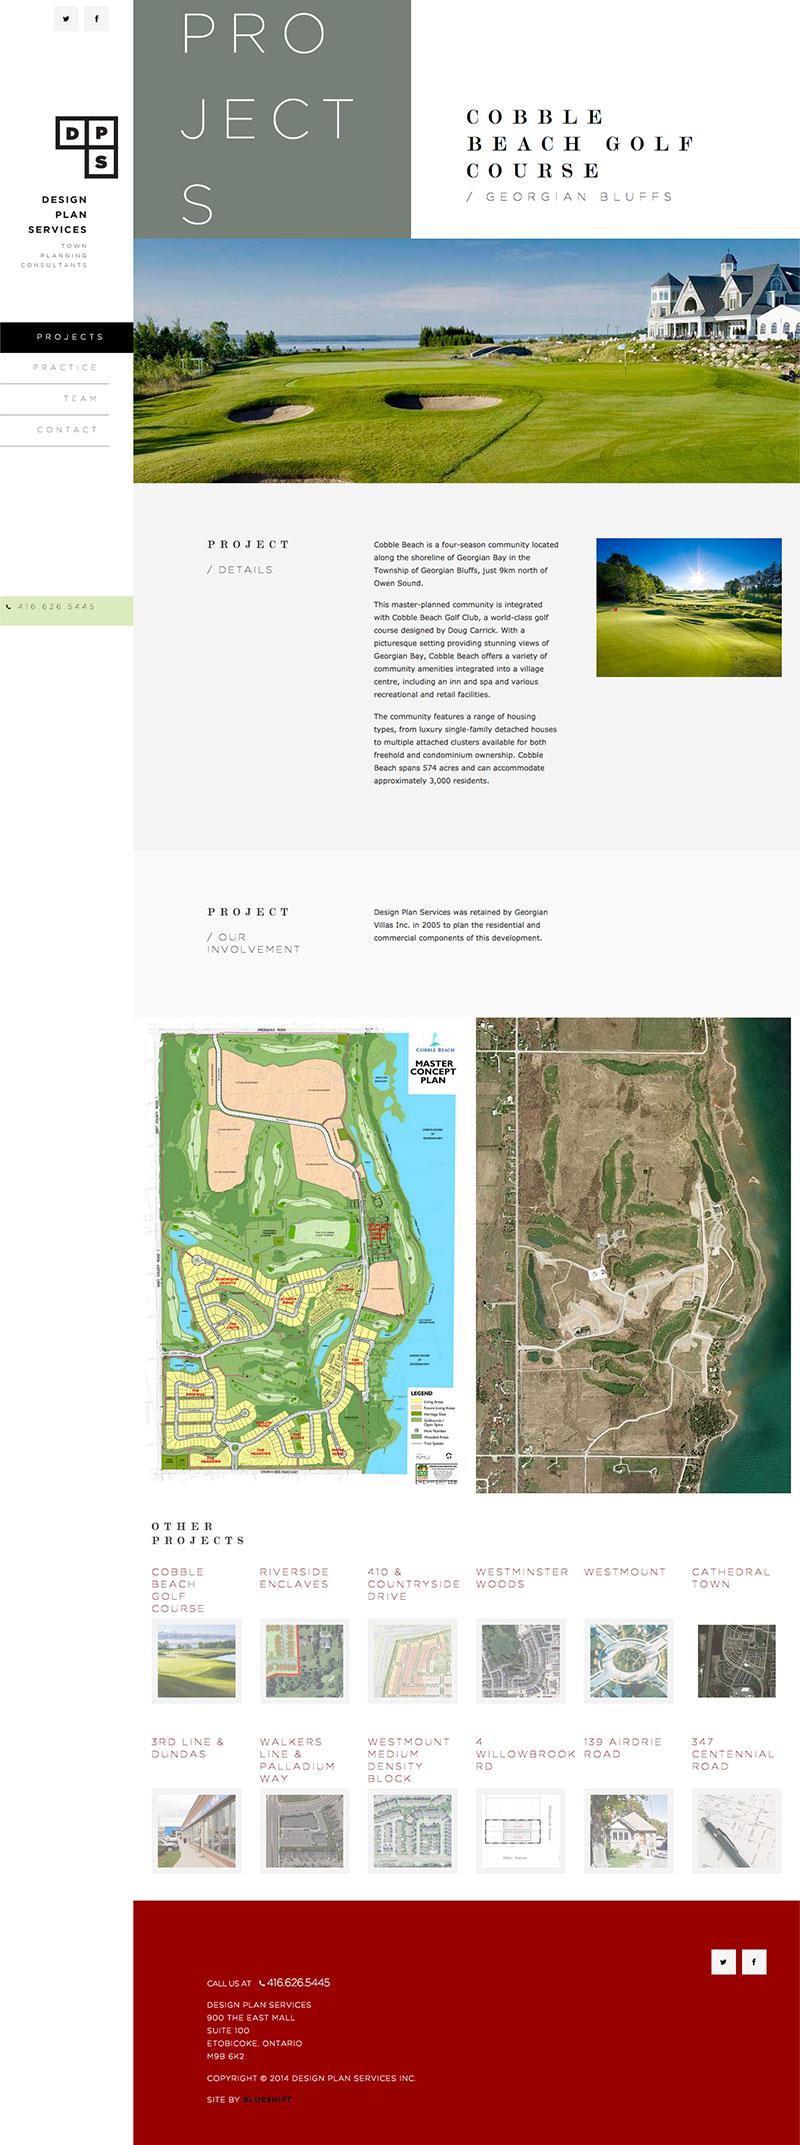 Blueshift Toronto Marketing Agency Portfolio Item - Design Plan Services Website Our Projects